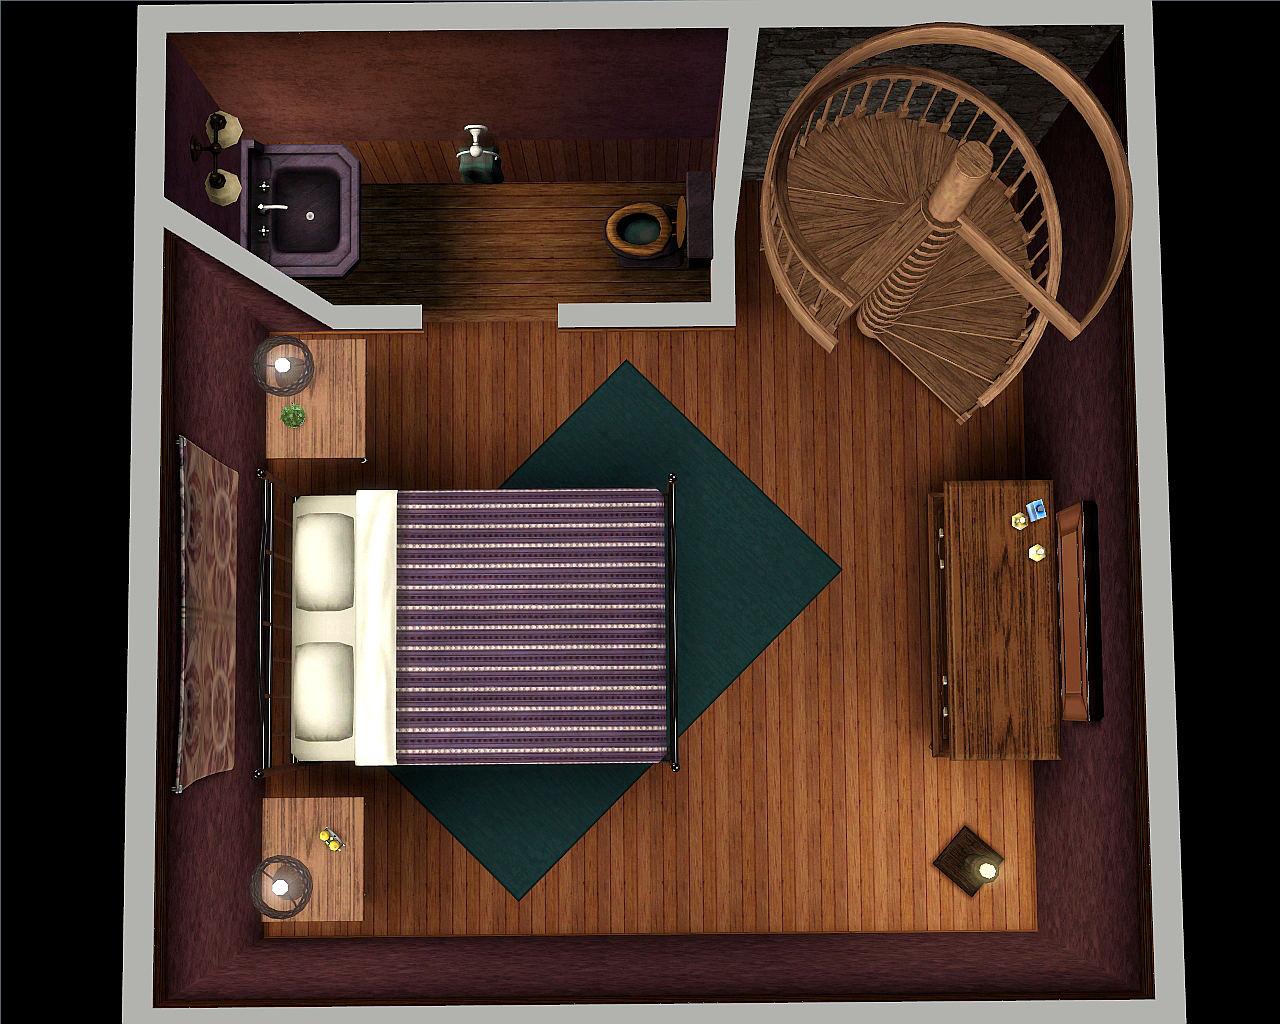 Bed design top view image - Advertisement